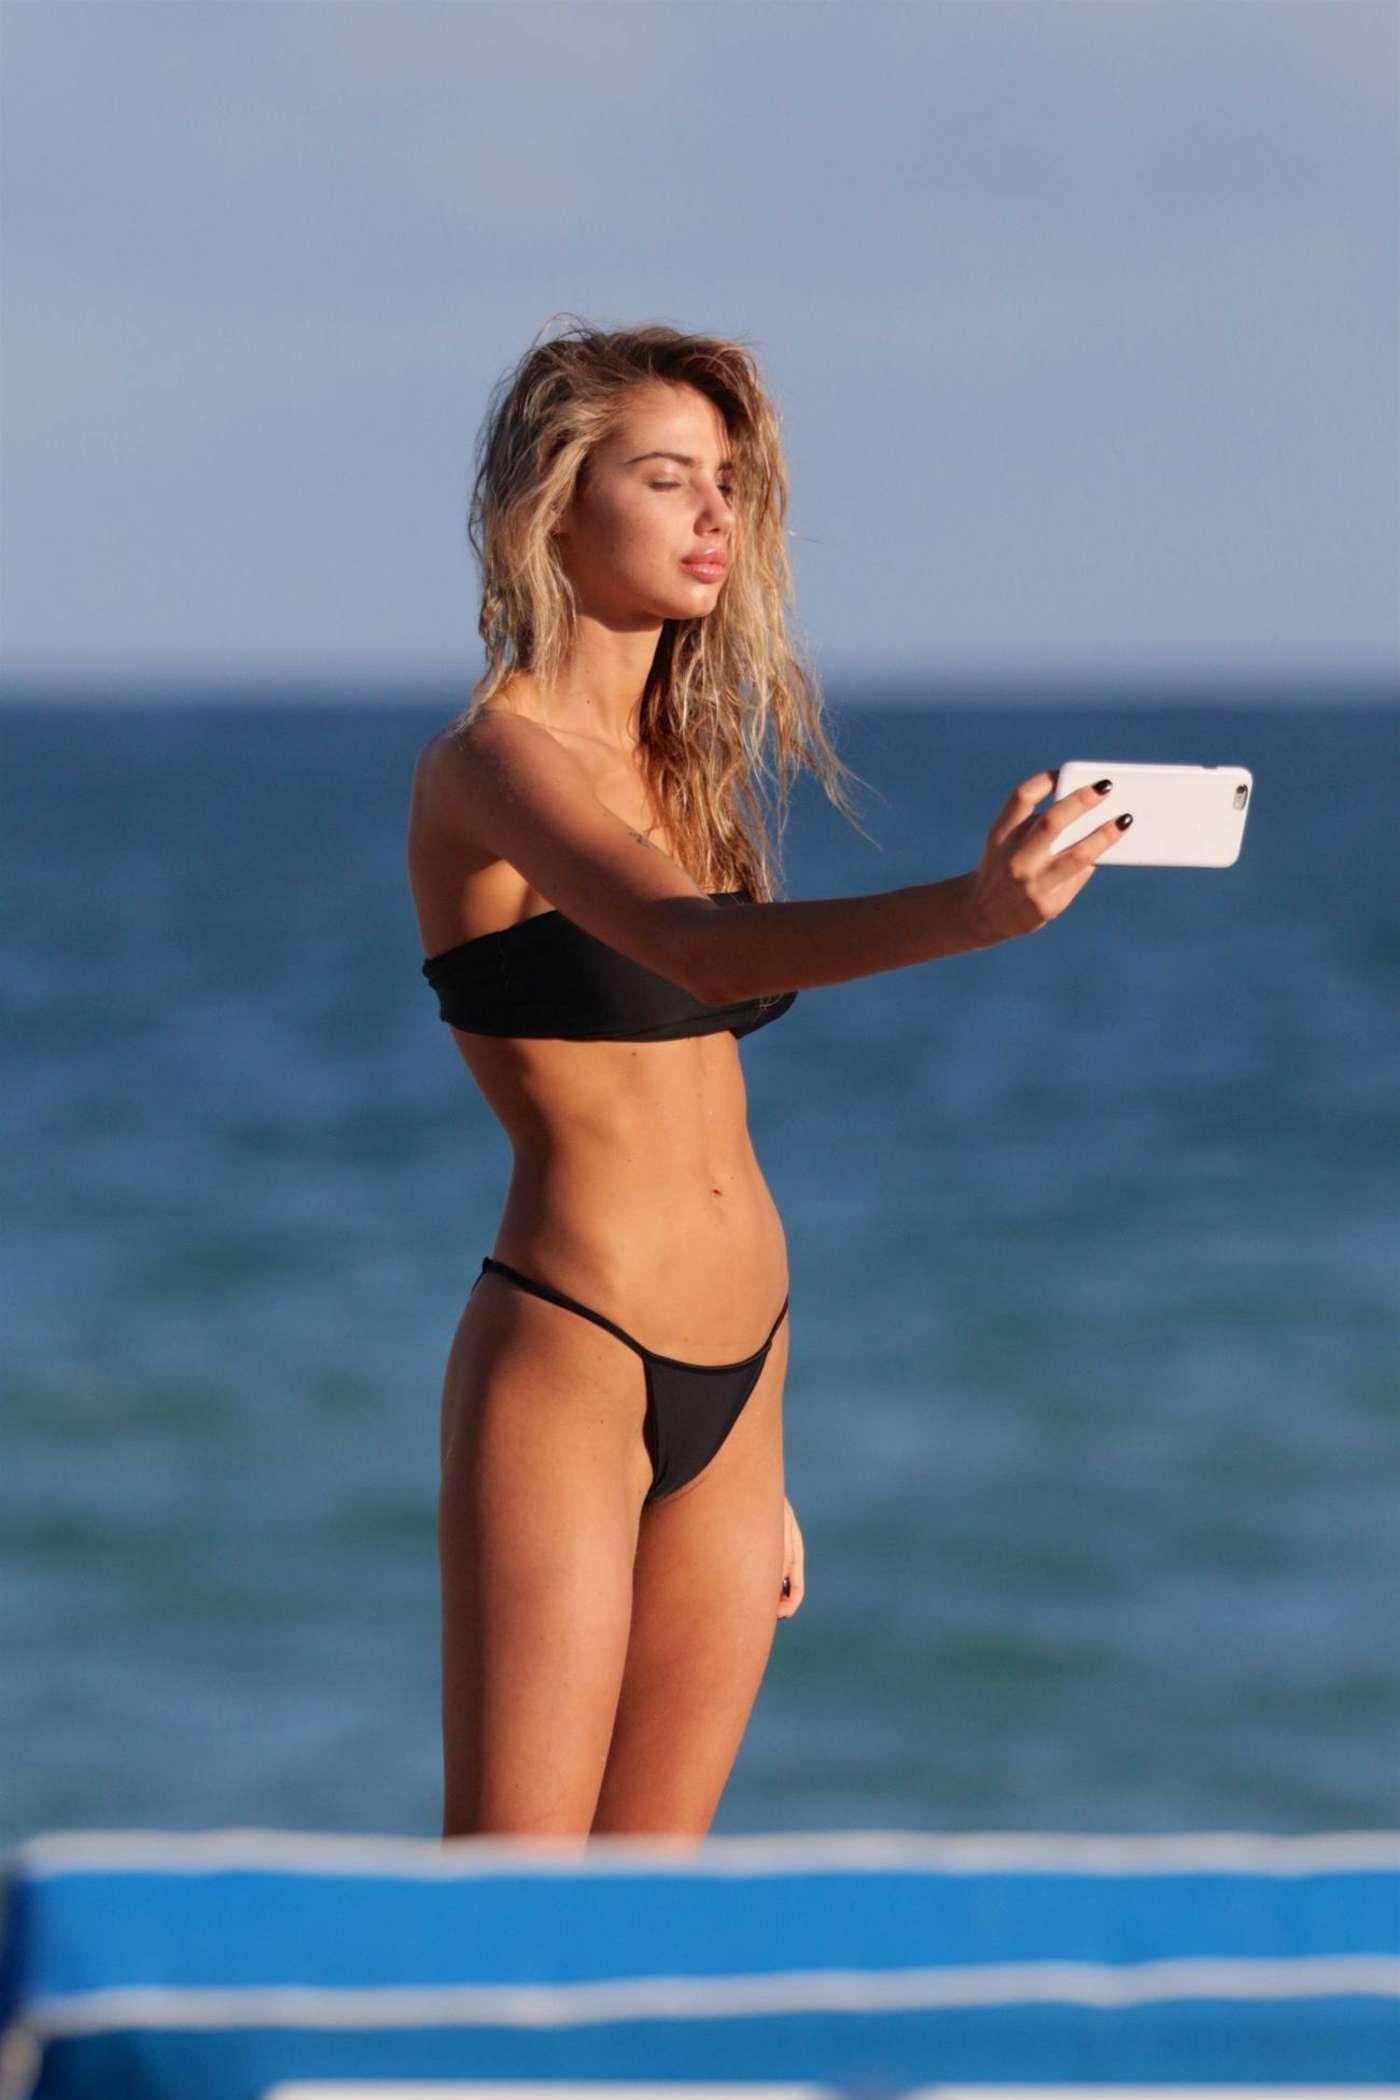 Bikini Sahara Ray nude (87 photo), Ass, Hot, Feet, swimsuit 2017